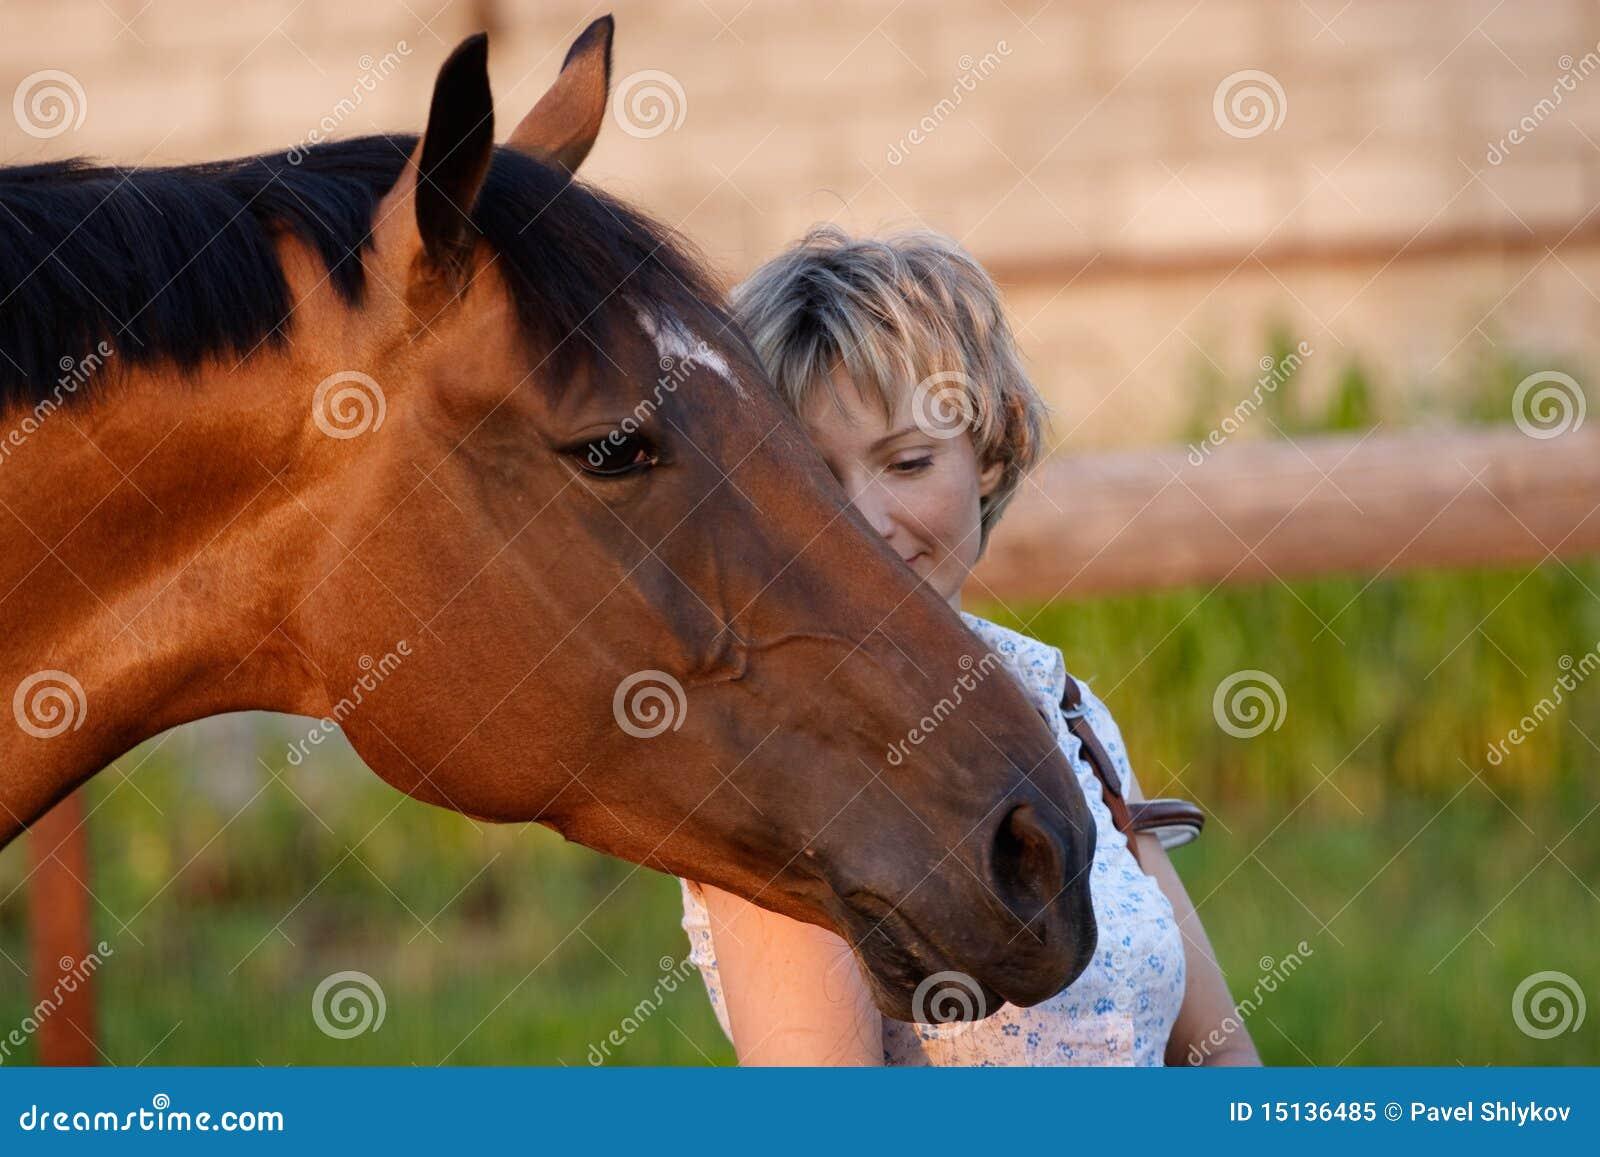 Horse head on womans shoulder